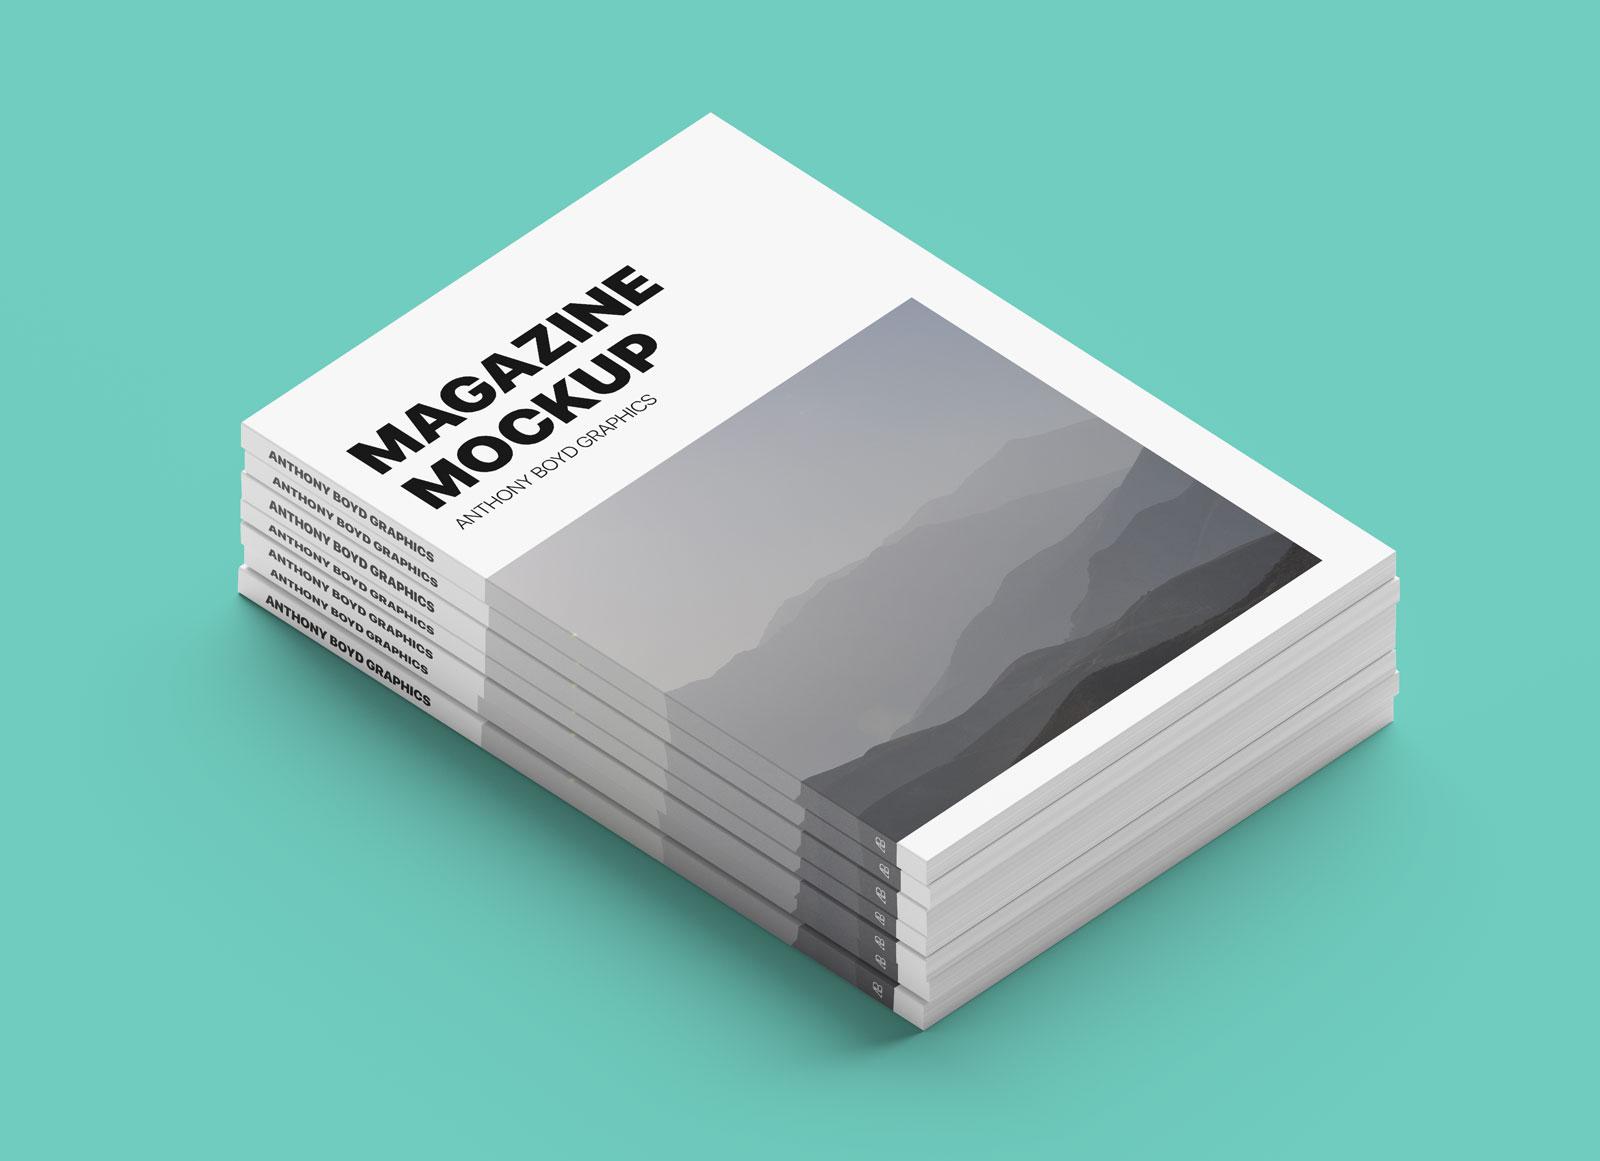 Free-Stacked-Magazine-Title-Mockup-PSD